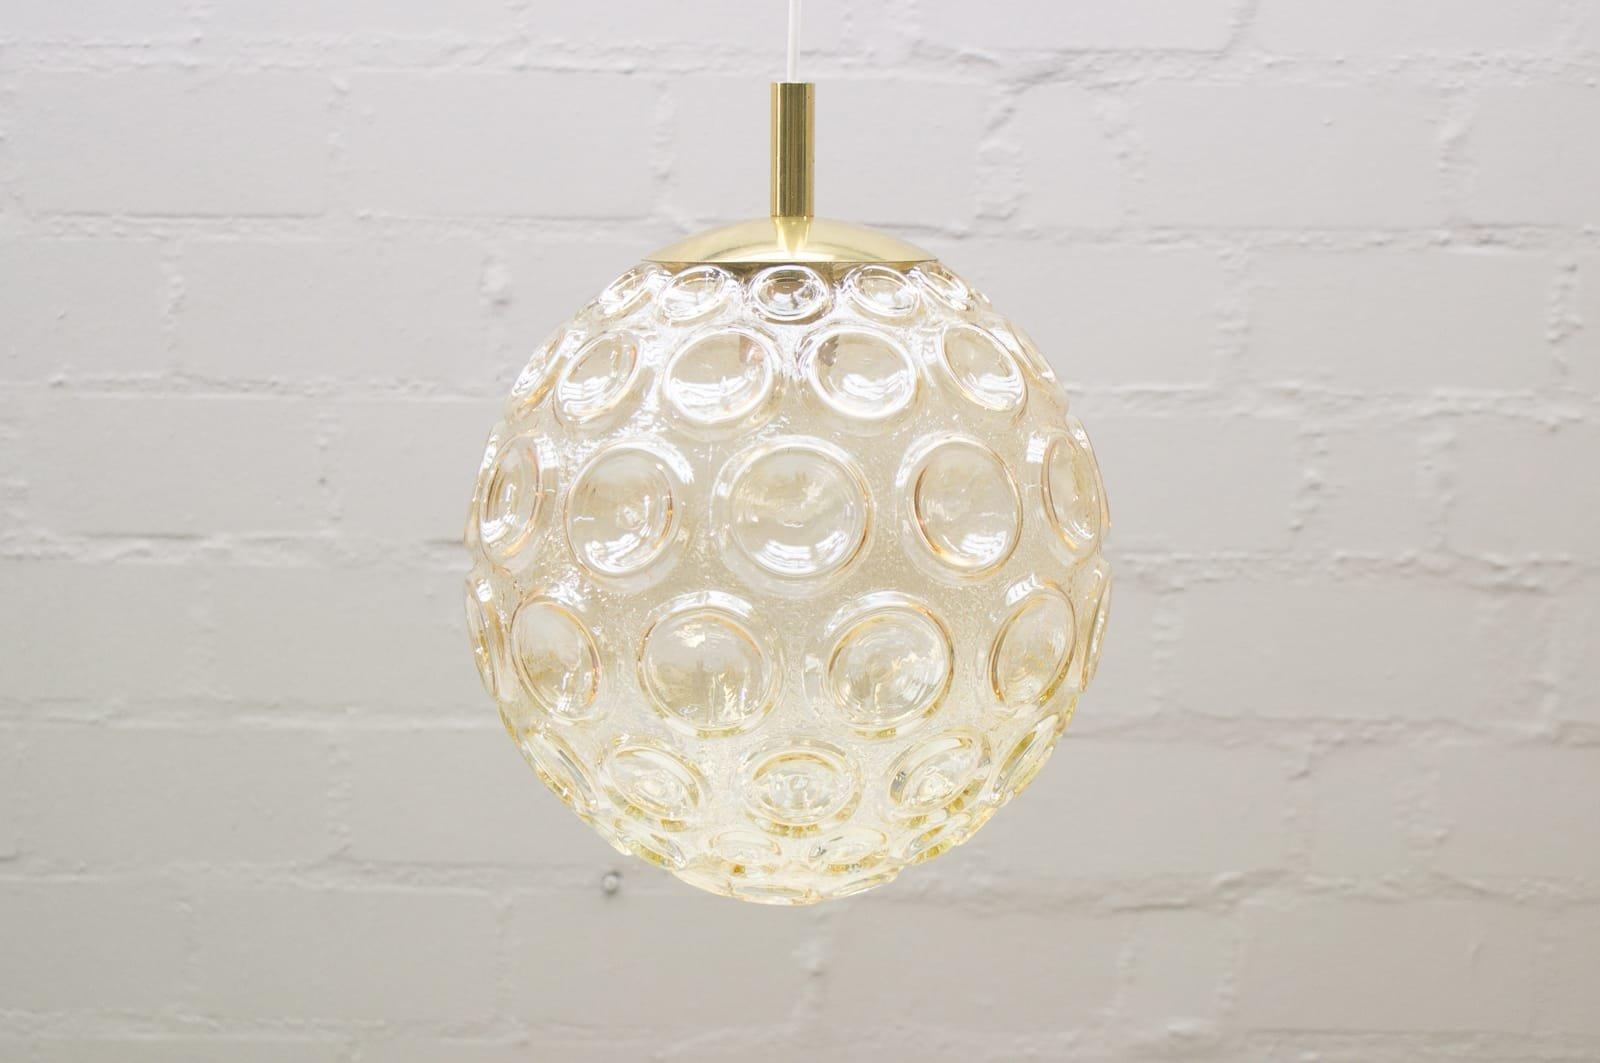 gro e bubble glas h ngelampe 1960er bei pamono kaufen. Black Bedroom Furniture Sets. Home Design Ideas